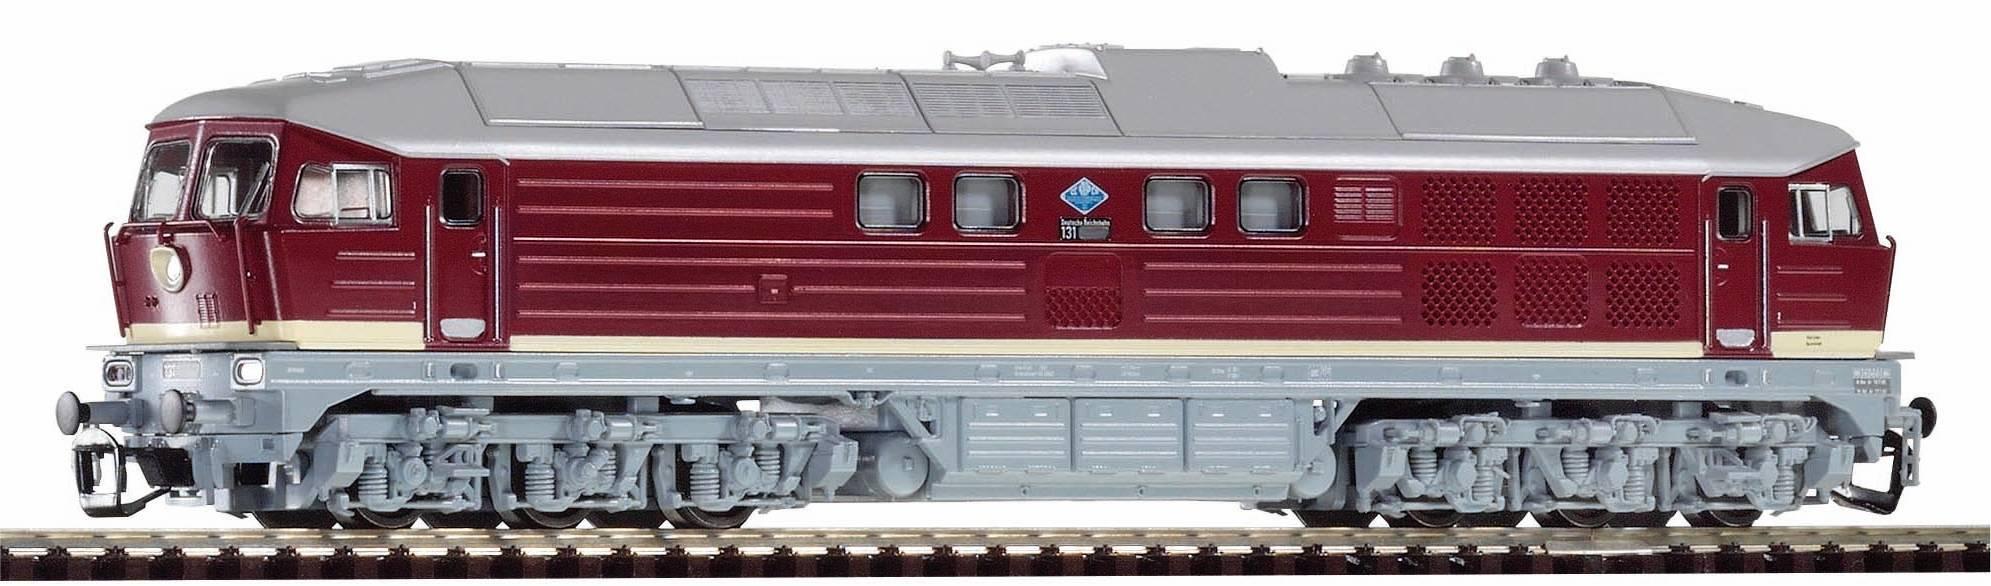 "Piko Dieselová lokomotiva BR 131 ""Ludmilla"" DR IV - 47327"